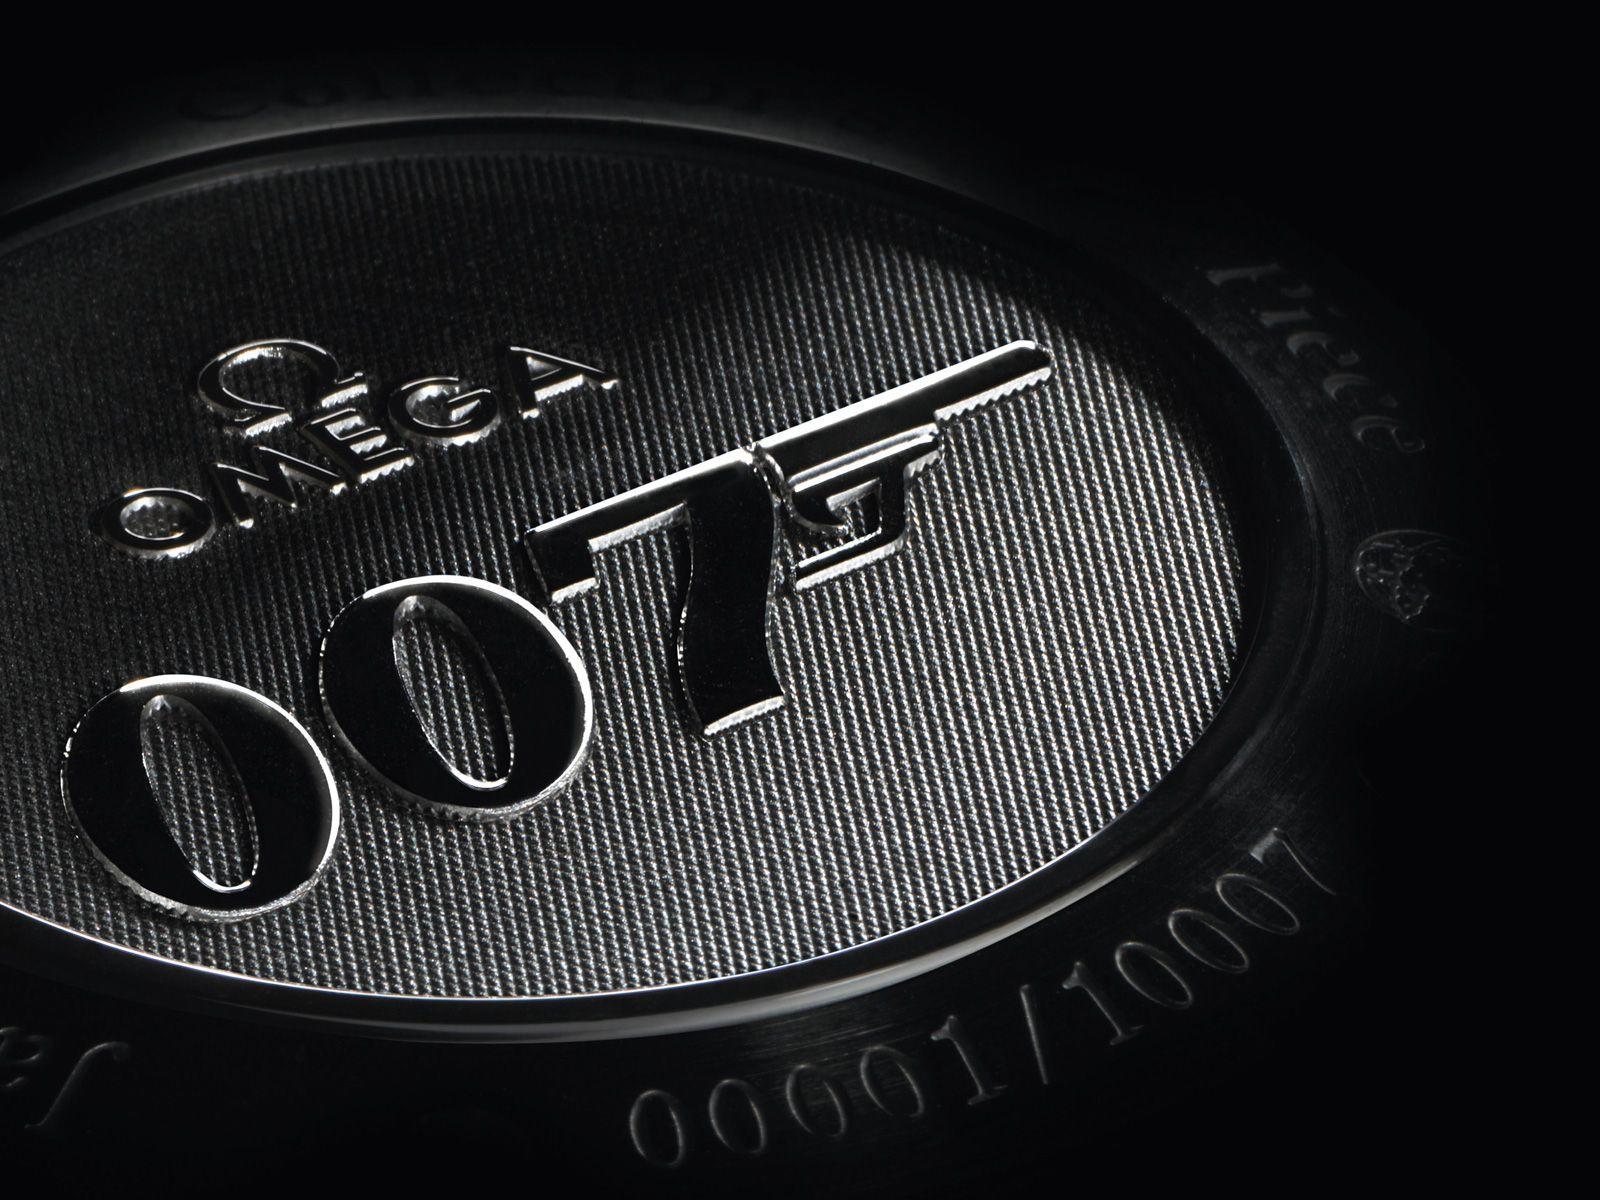 007 Logo Wallpapers HD - Wallpaper Cave